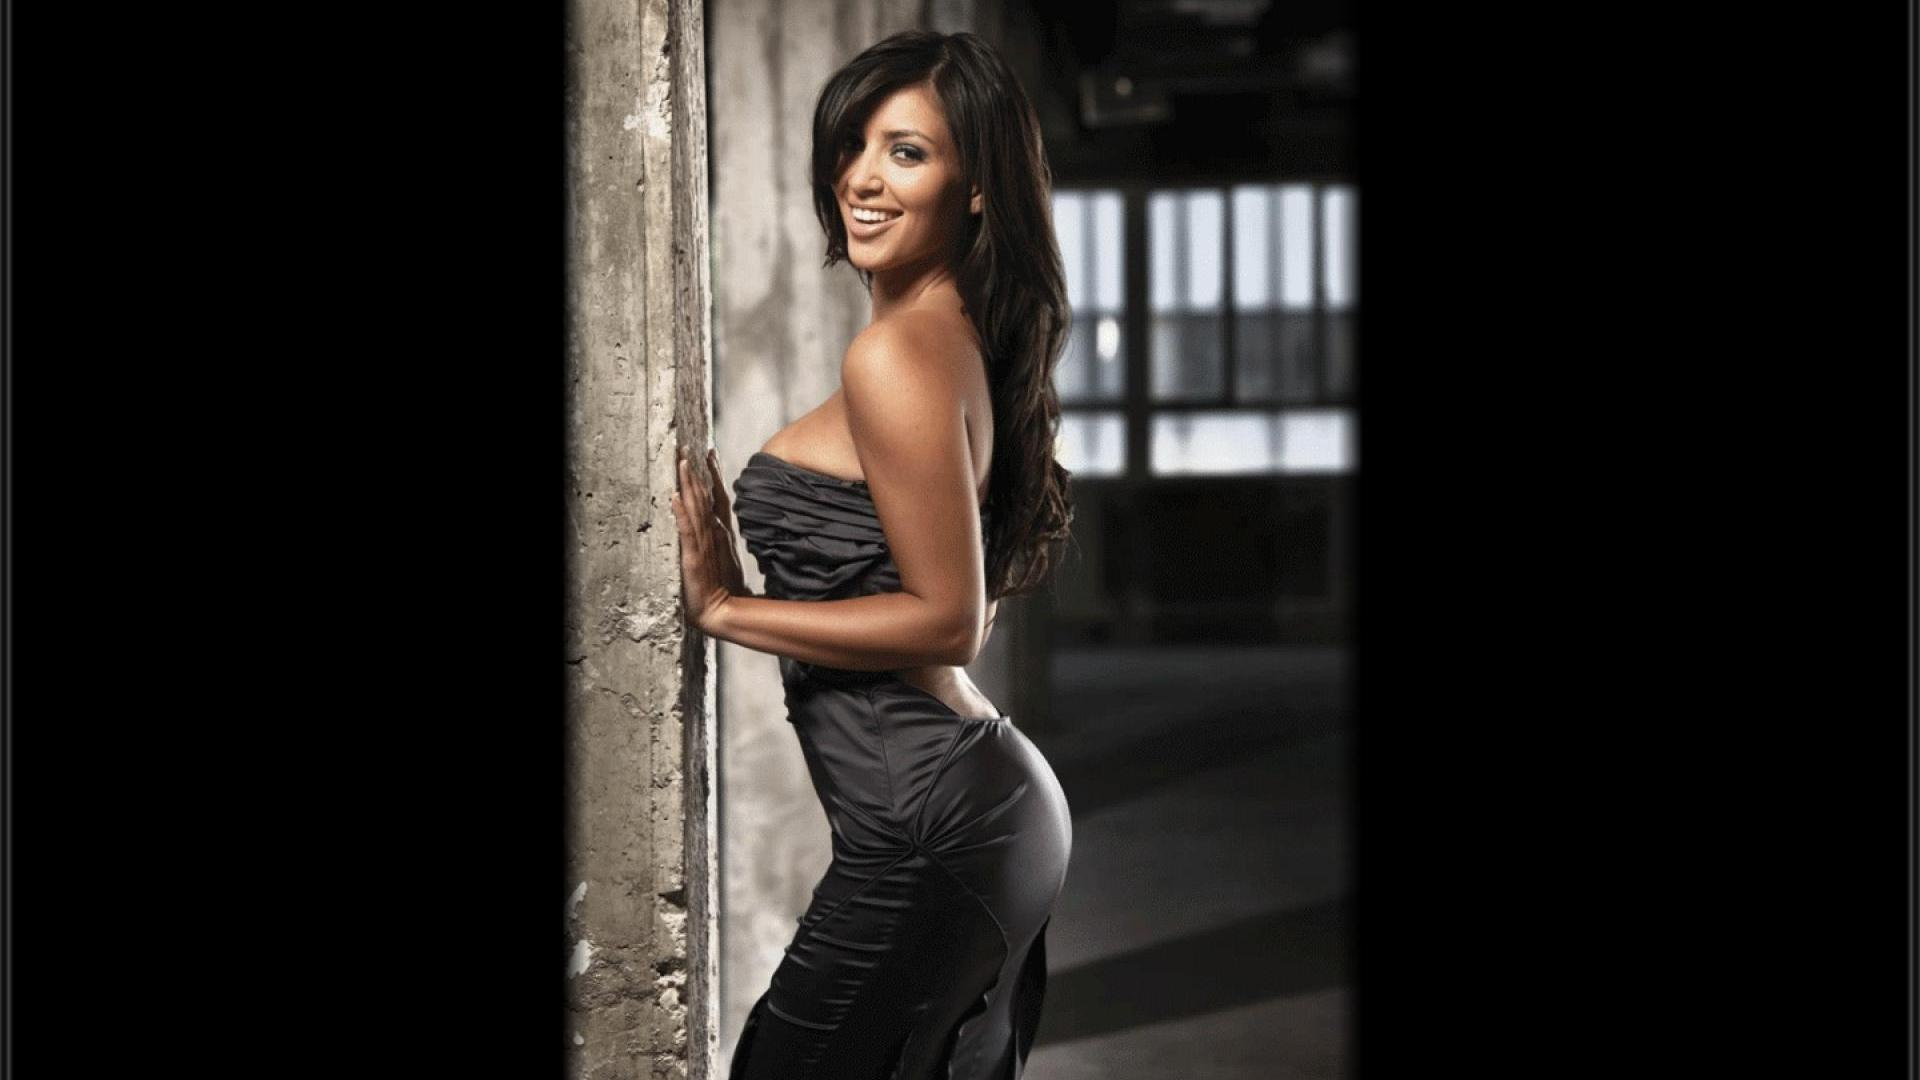 Vanessa lane porn star